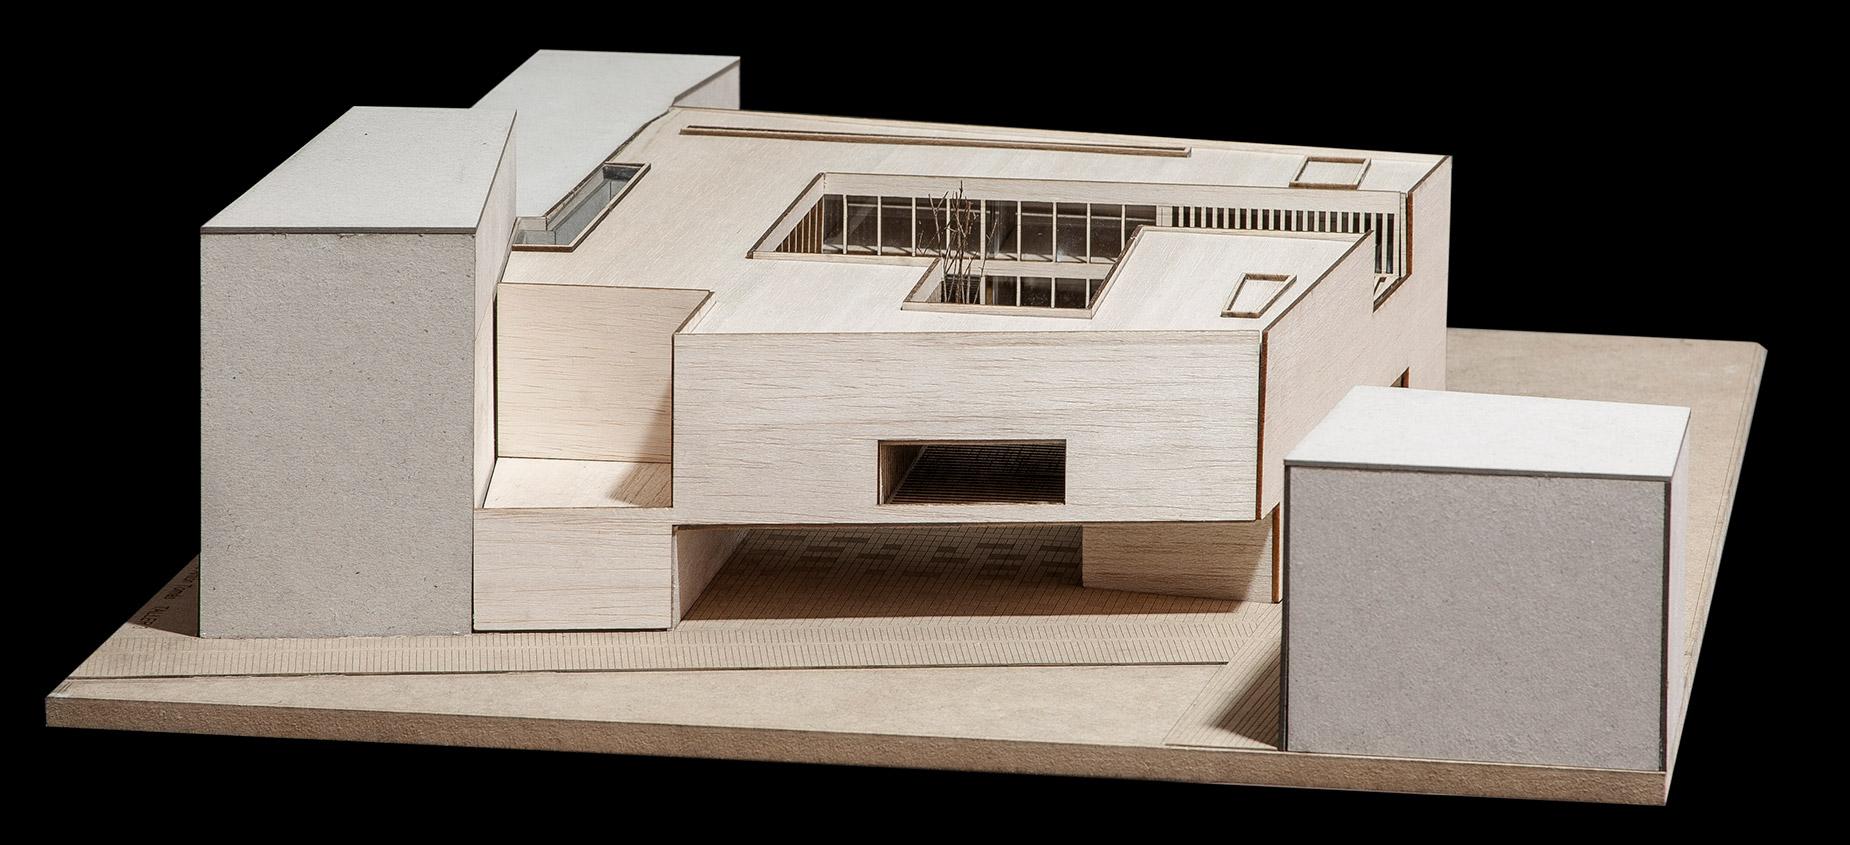 maqueta-arquitectura-architecture model-valencia-maqueta pfc-ETSAV-Biblioteca-arquimaqueta (3)